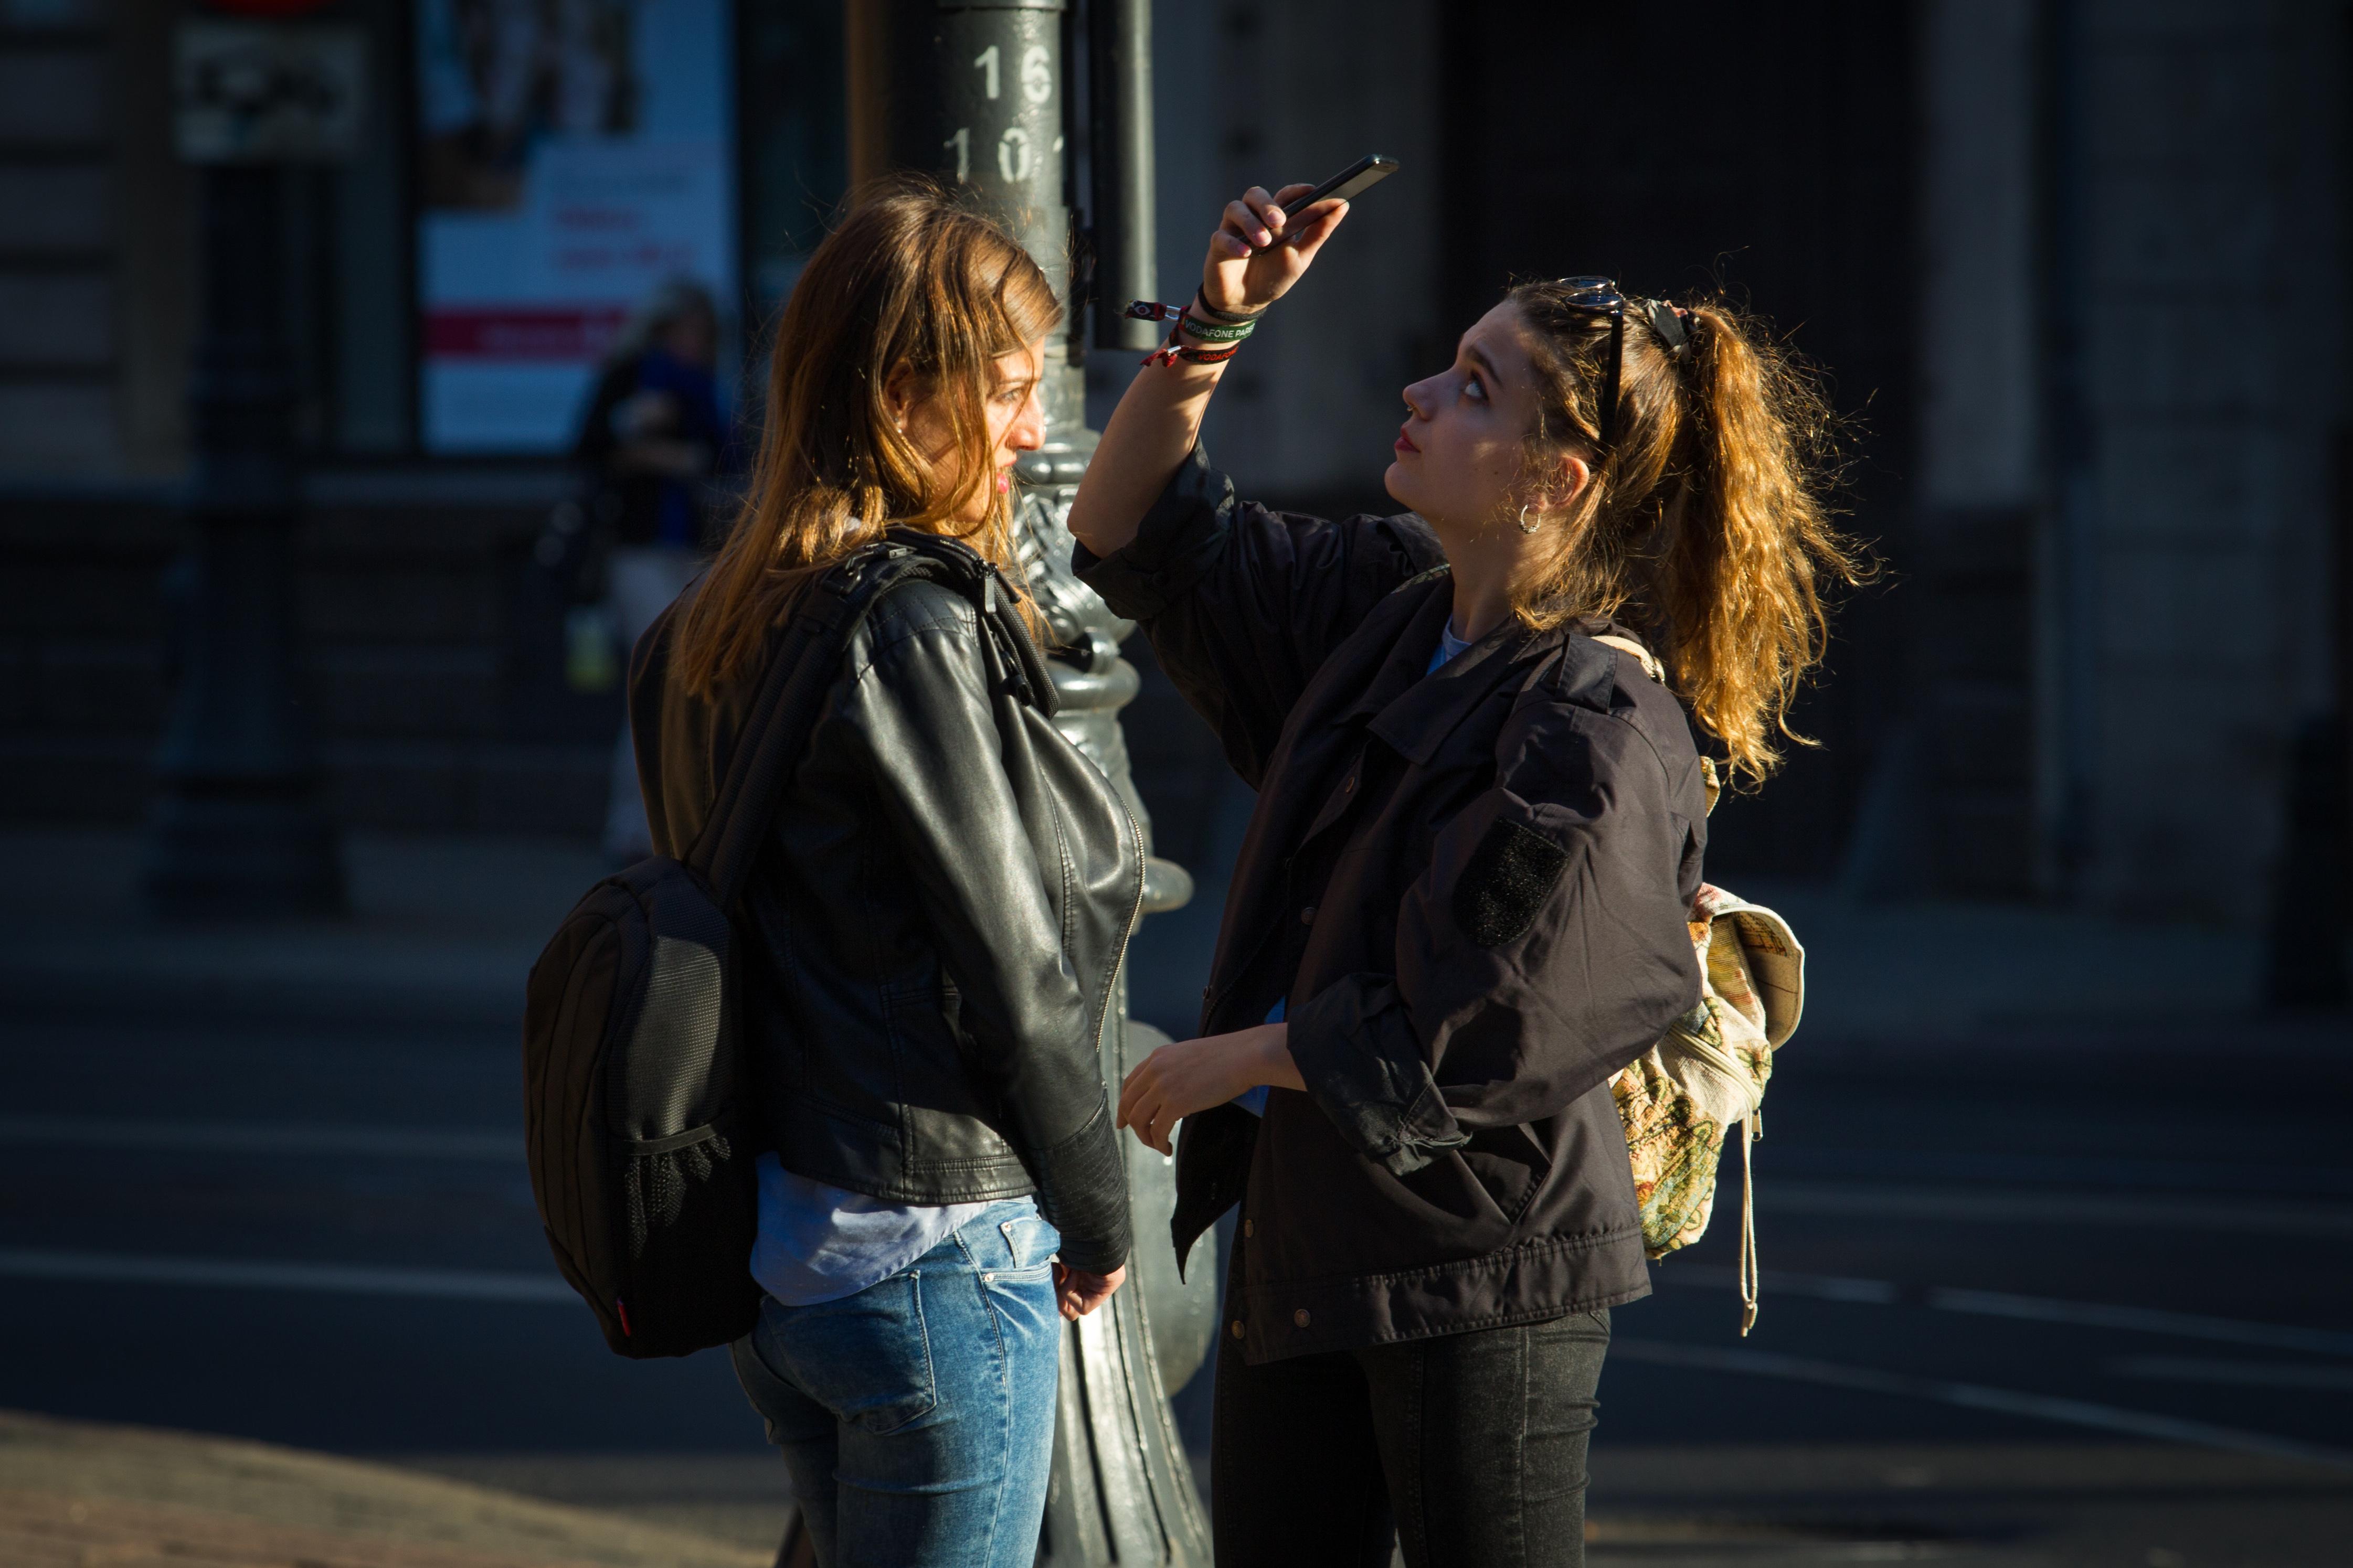 Teen Girls Using Cell Phone